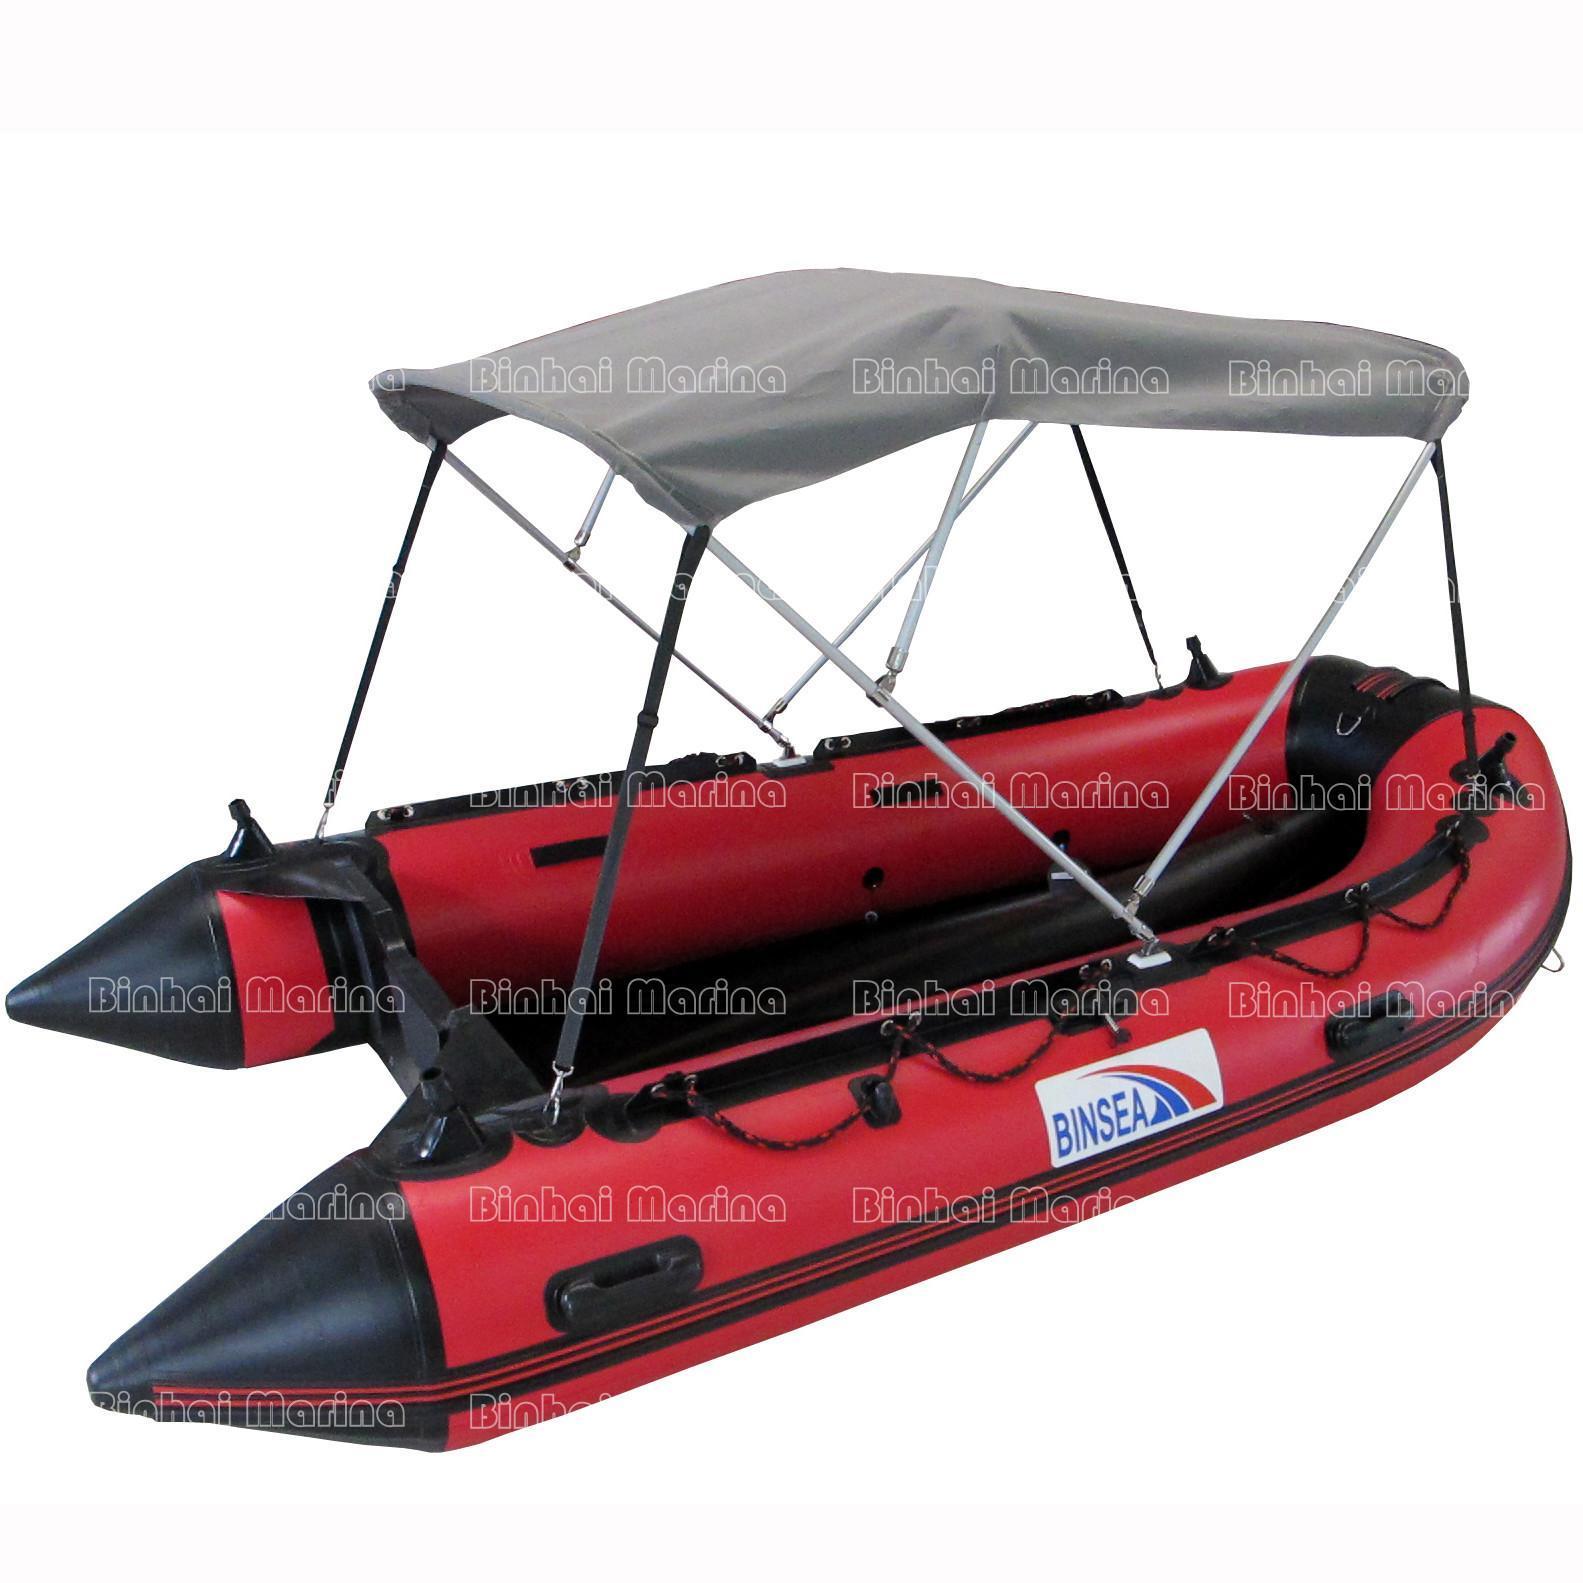 лодка на резиновом ходу